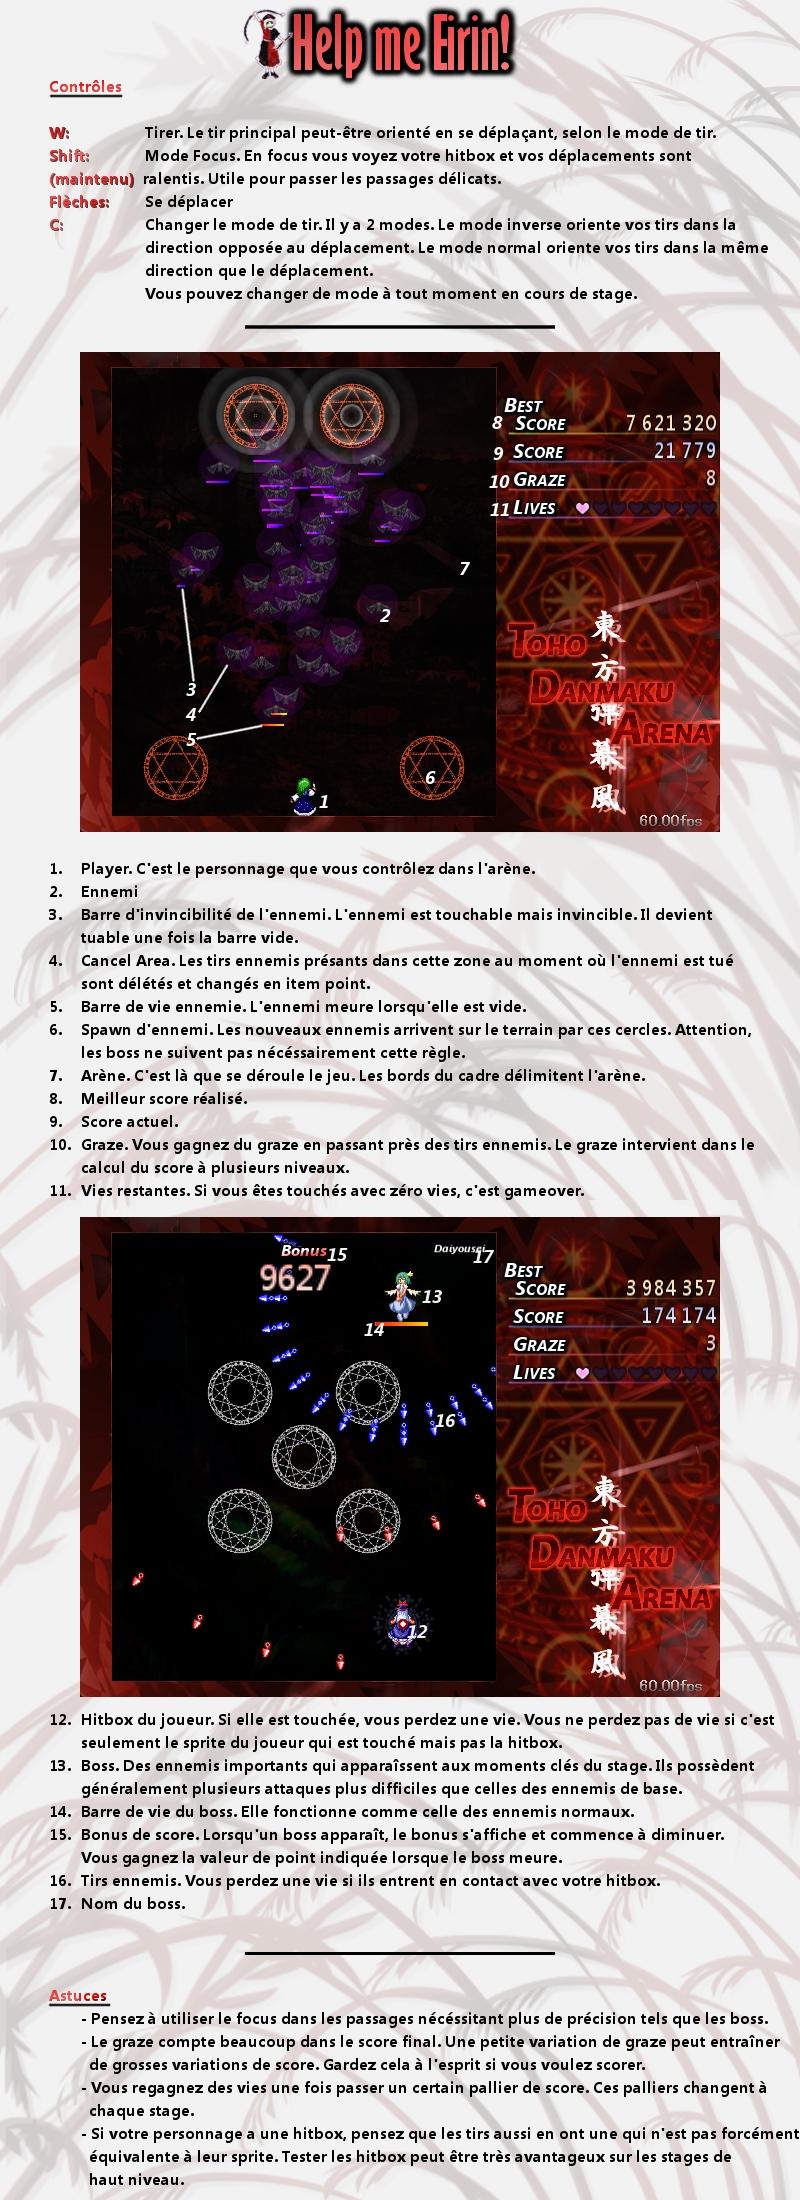 Touhou Danmaku Arena Instructions-4255937